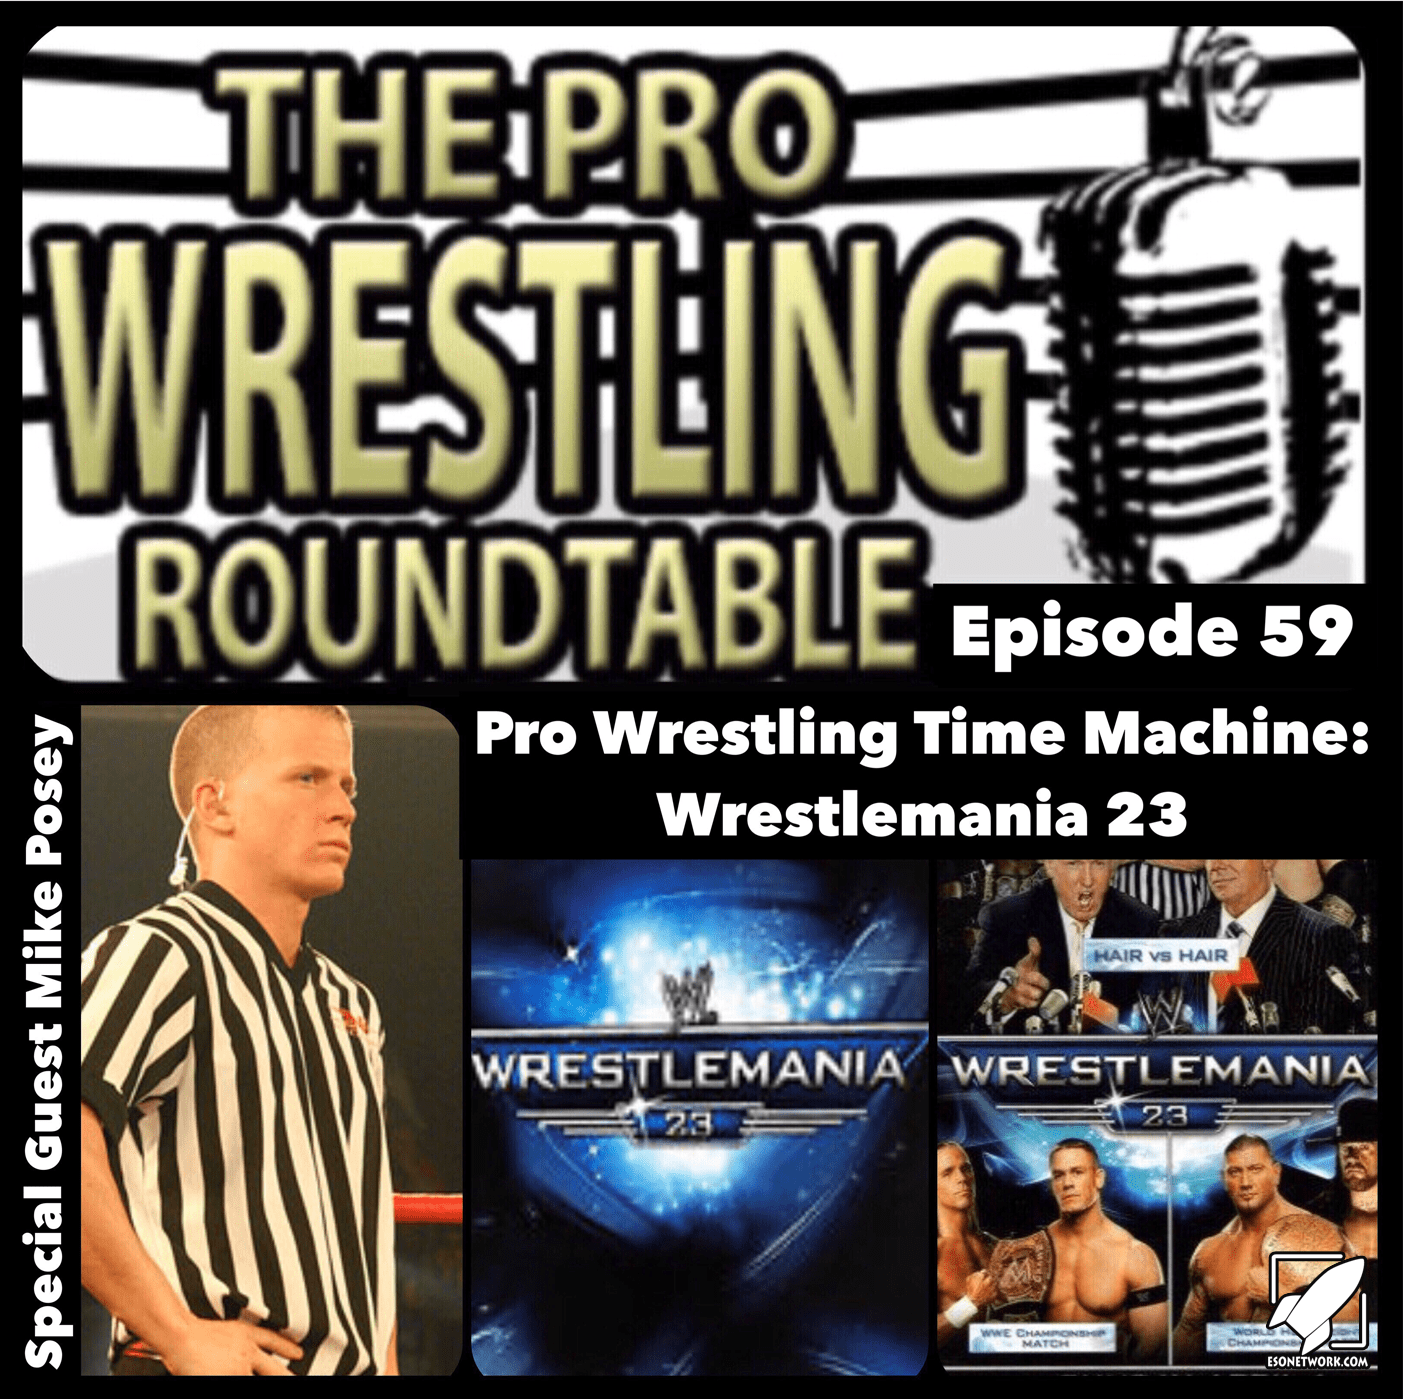 Pro Wrestling Roundtable Ep 59